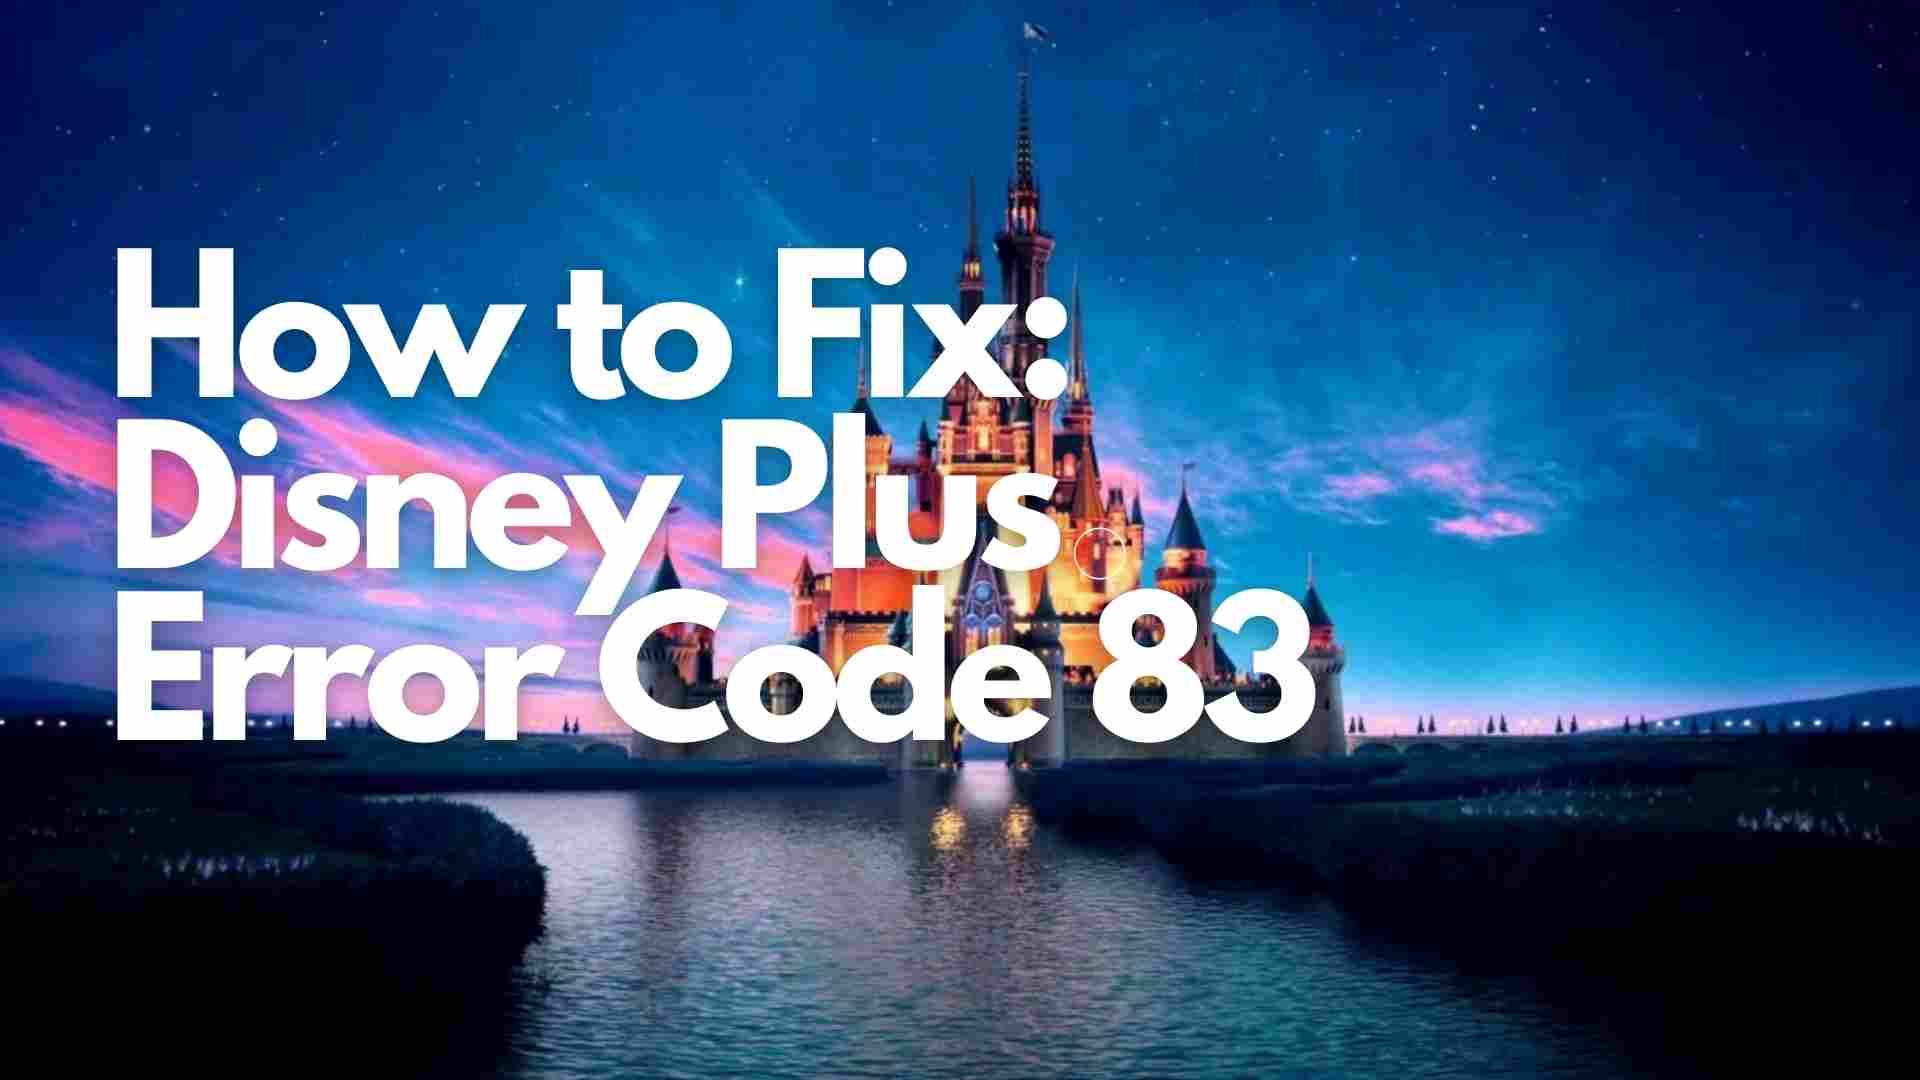 How to Fix: Disney Plus Error Code 83